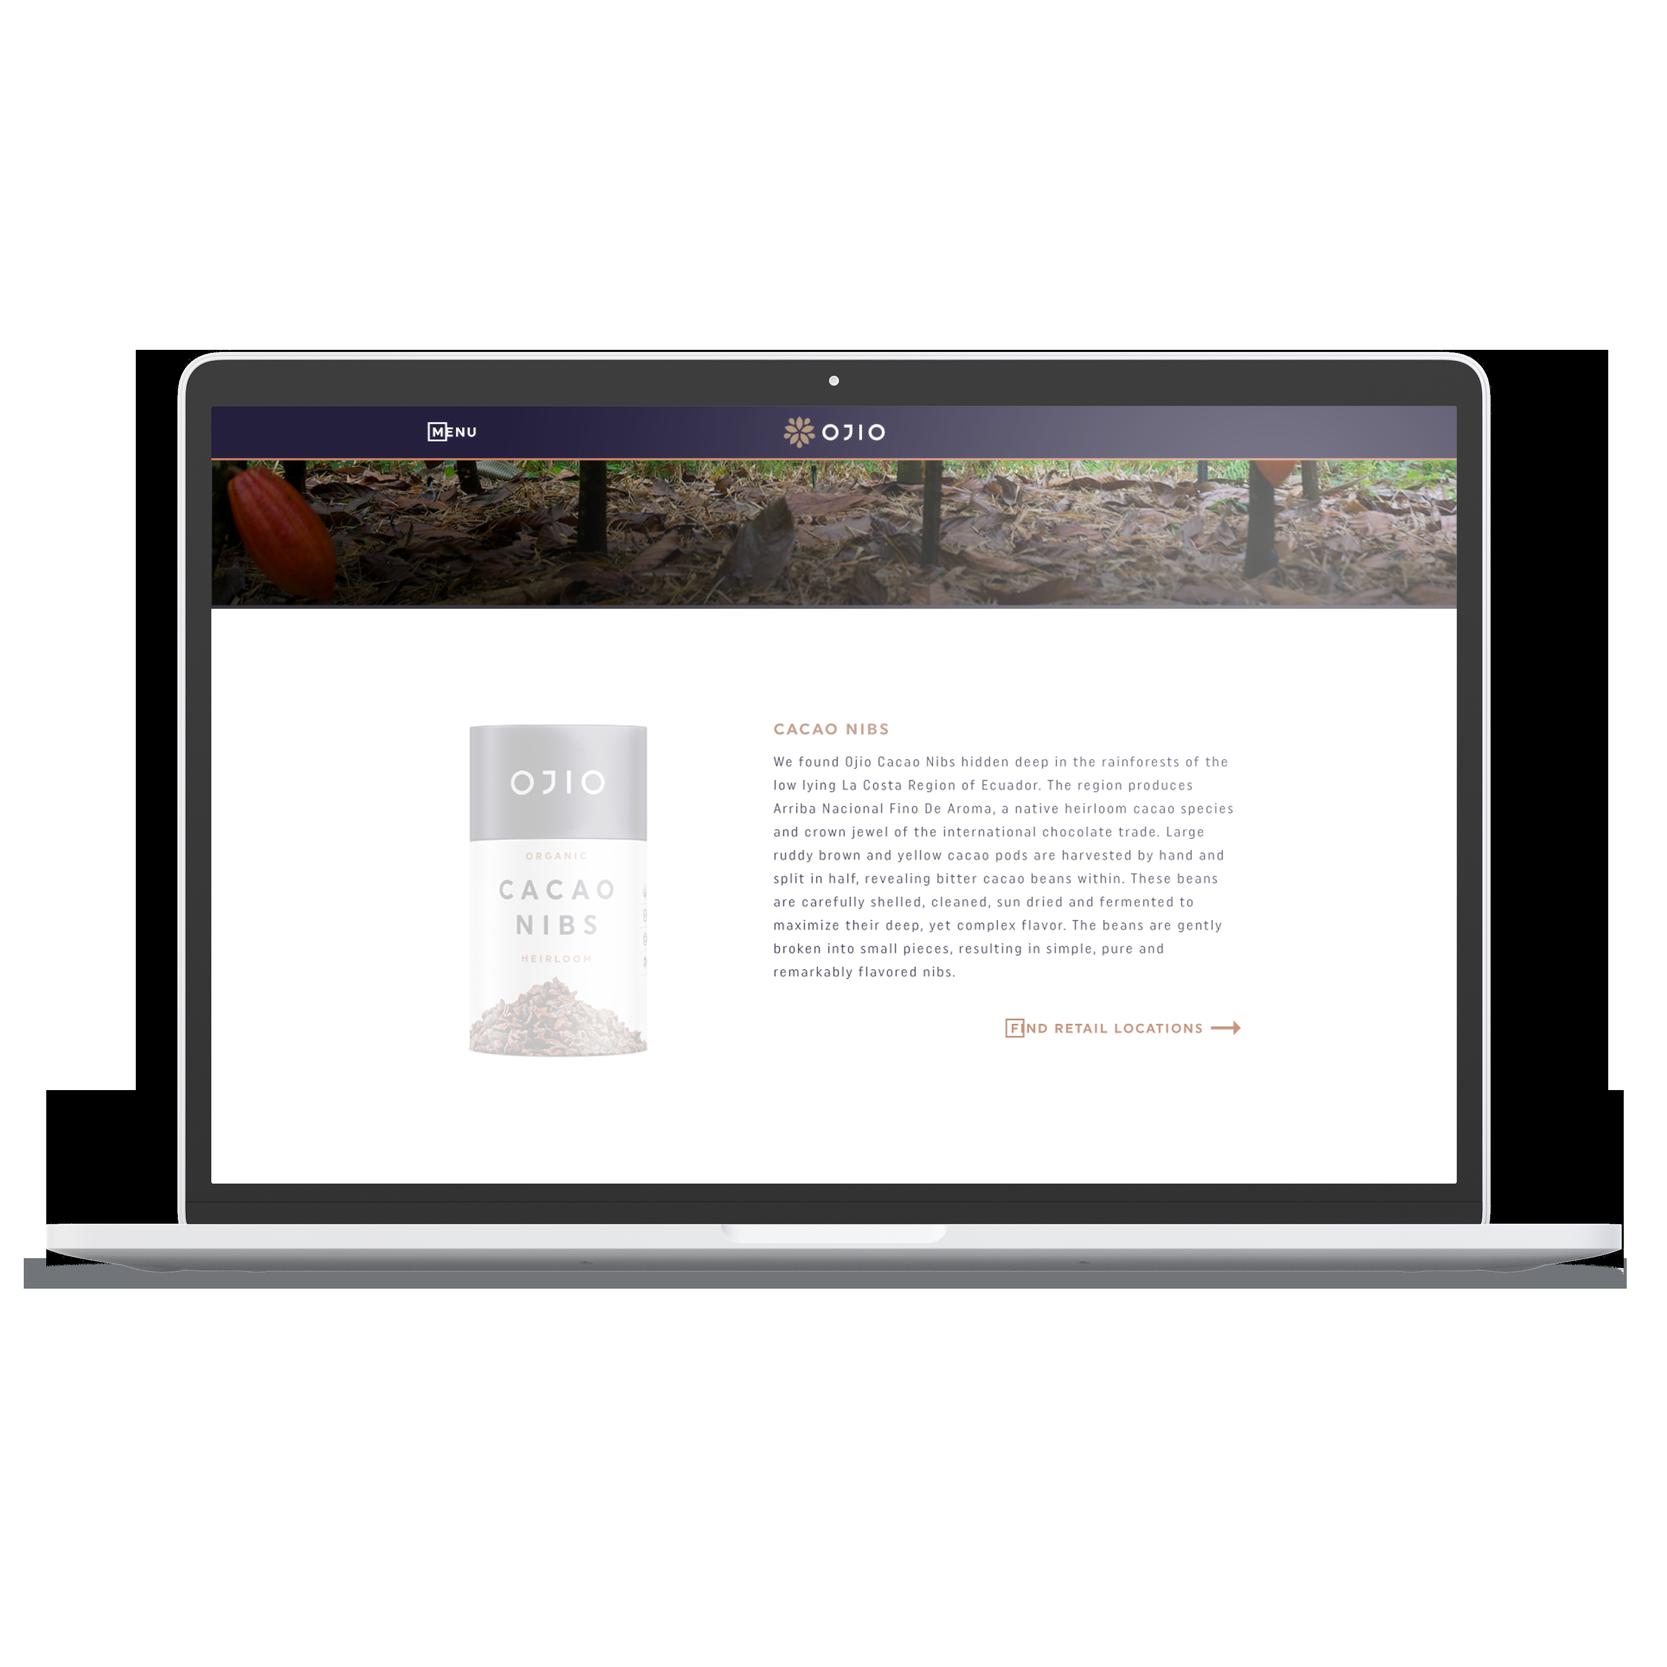 laptop desktop OJIO product page summary